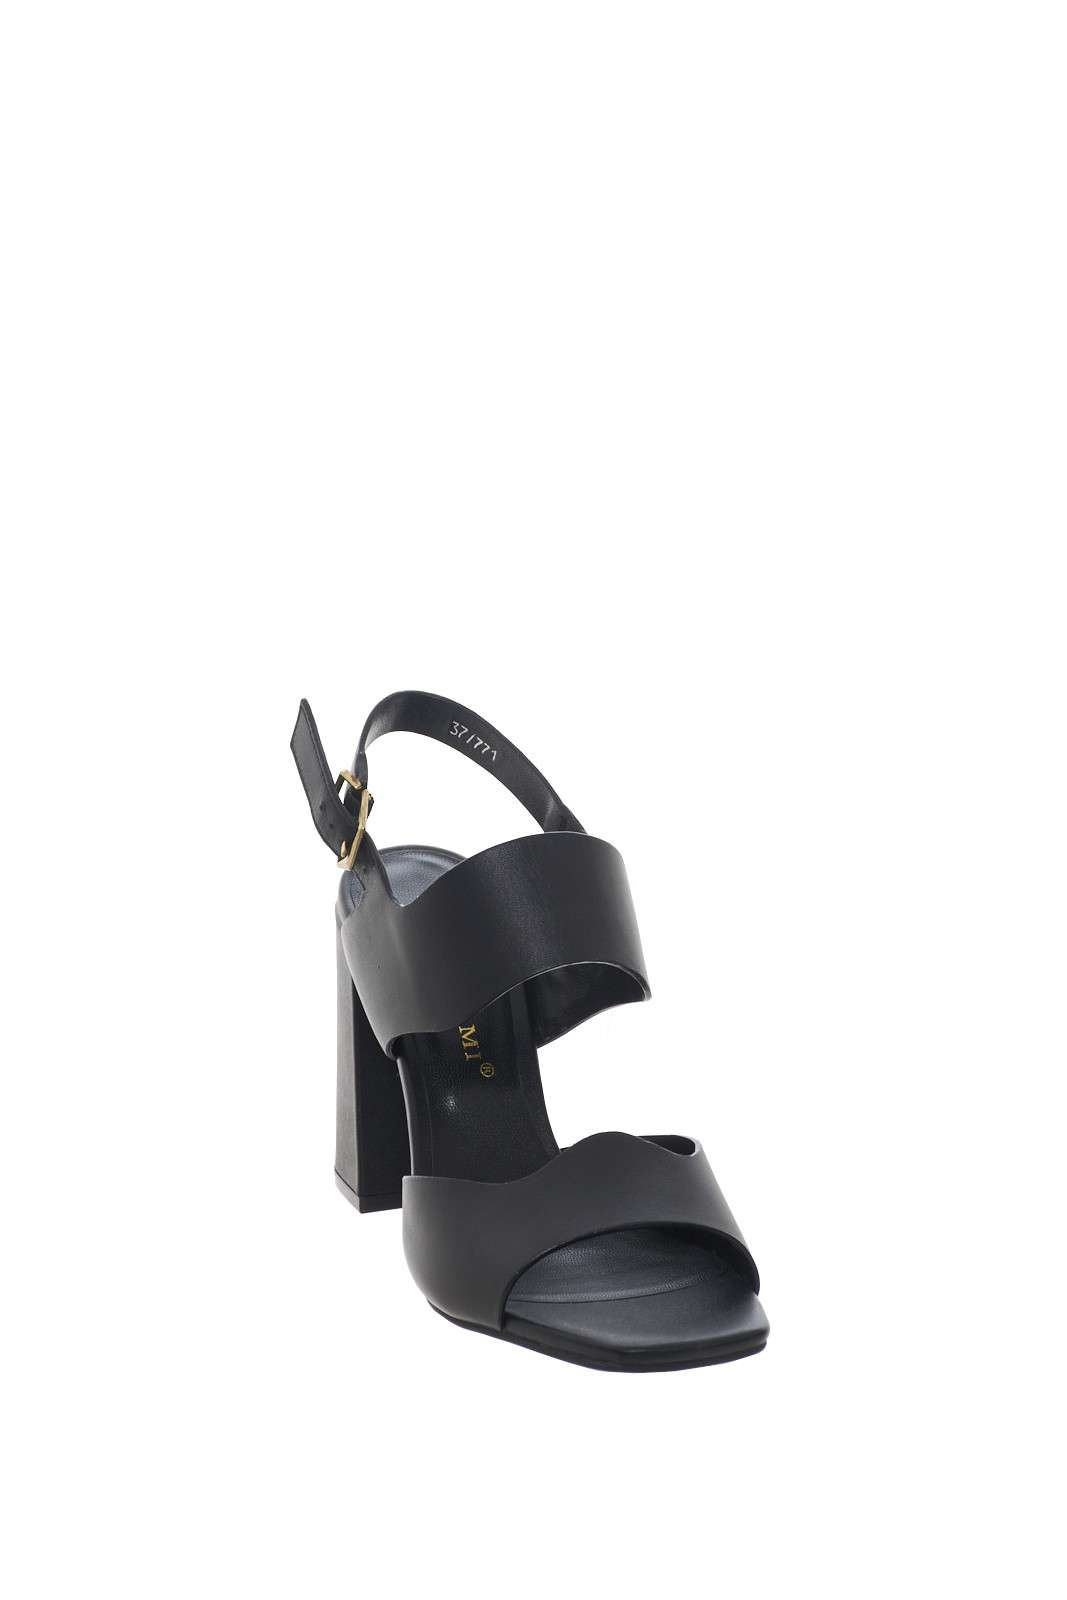 https://www.parmax.com/media/catalog/product/a/i/PE-outlet_parmax-sandali-donna-Bruno-Premi-bw1402p-C.jpg